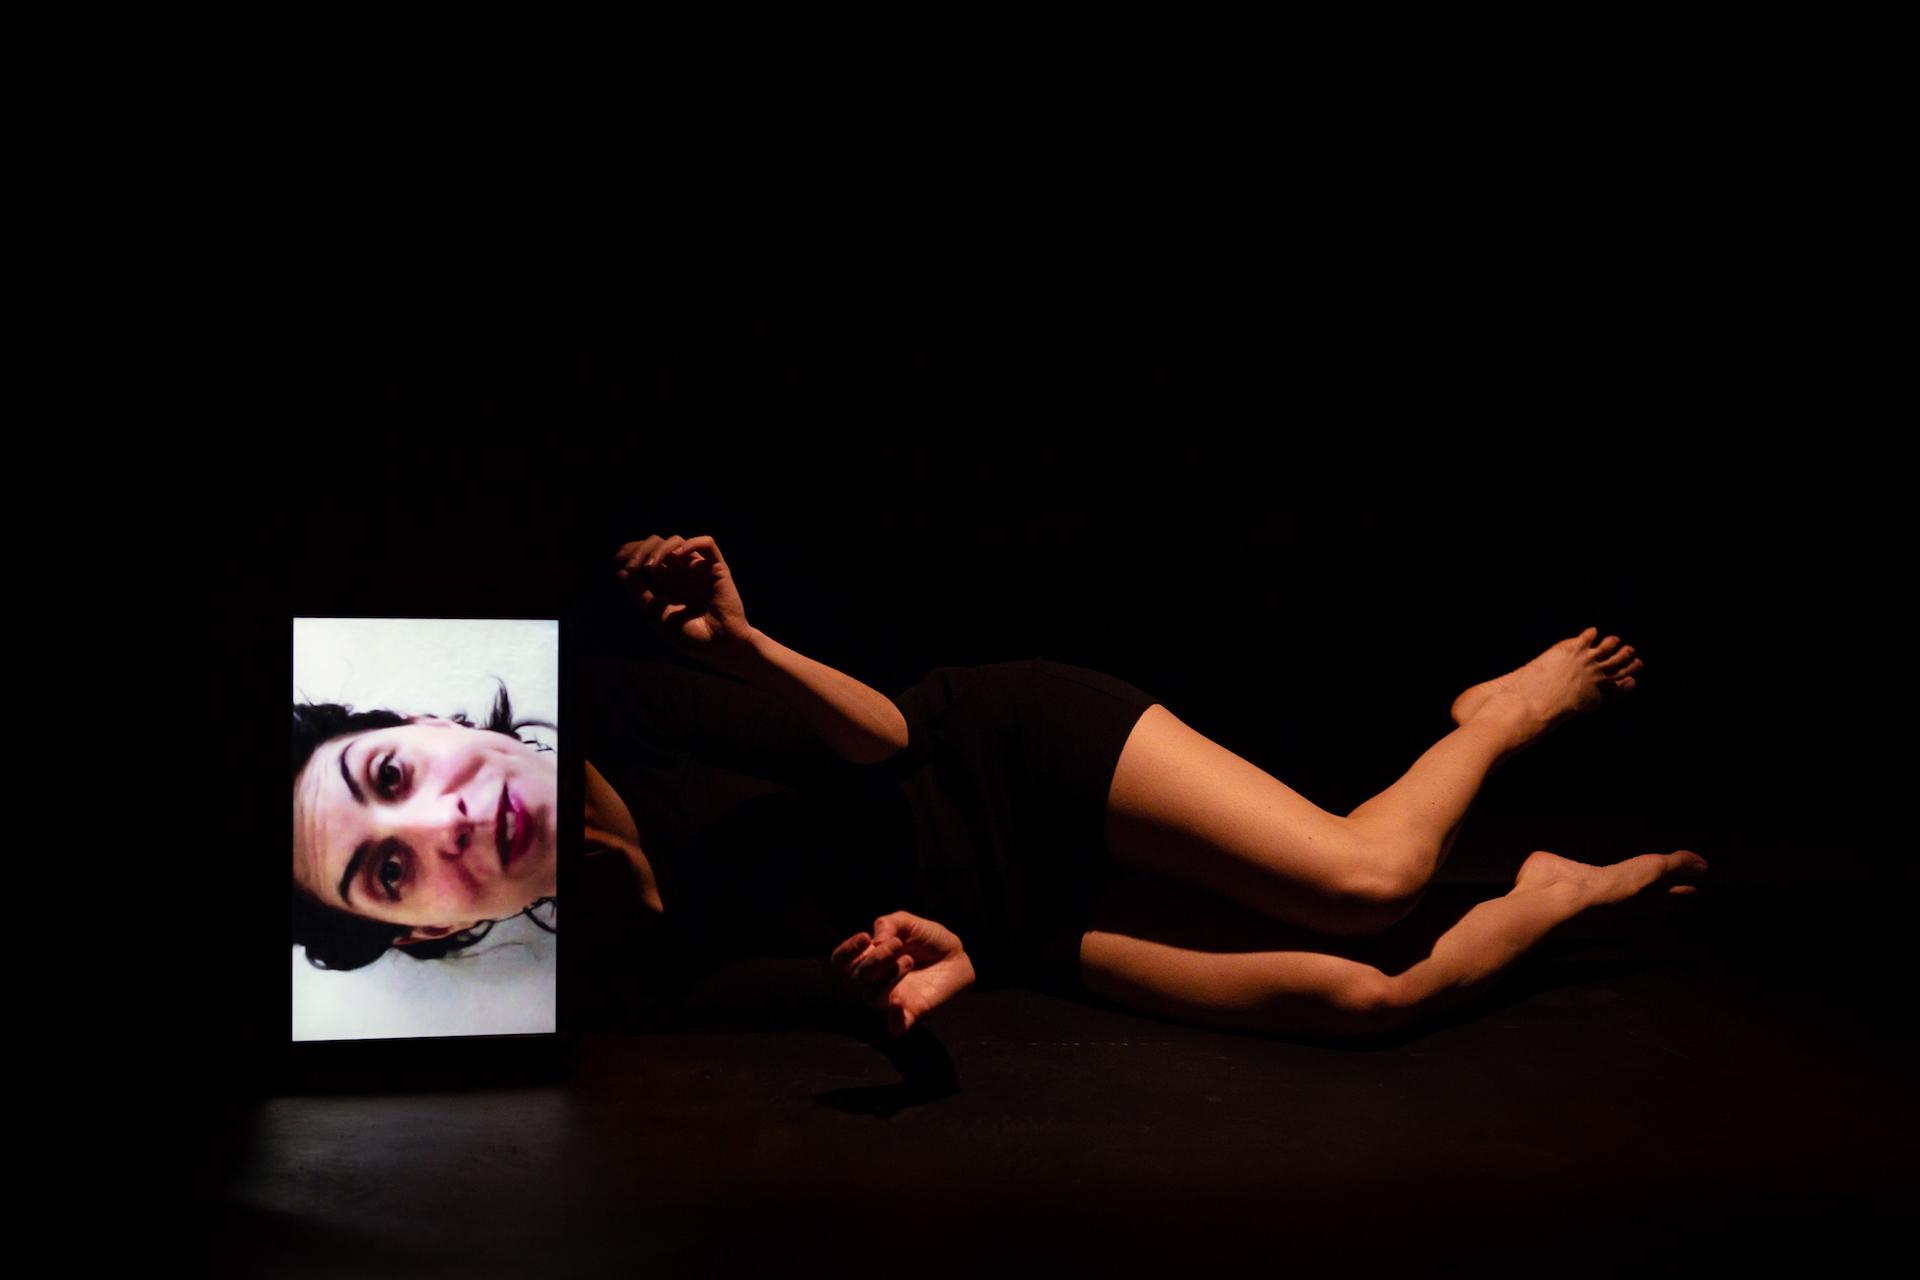 T.I.N.A. (There Is No Alternative) | Giselda Ranieri